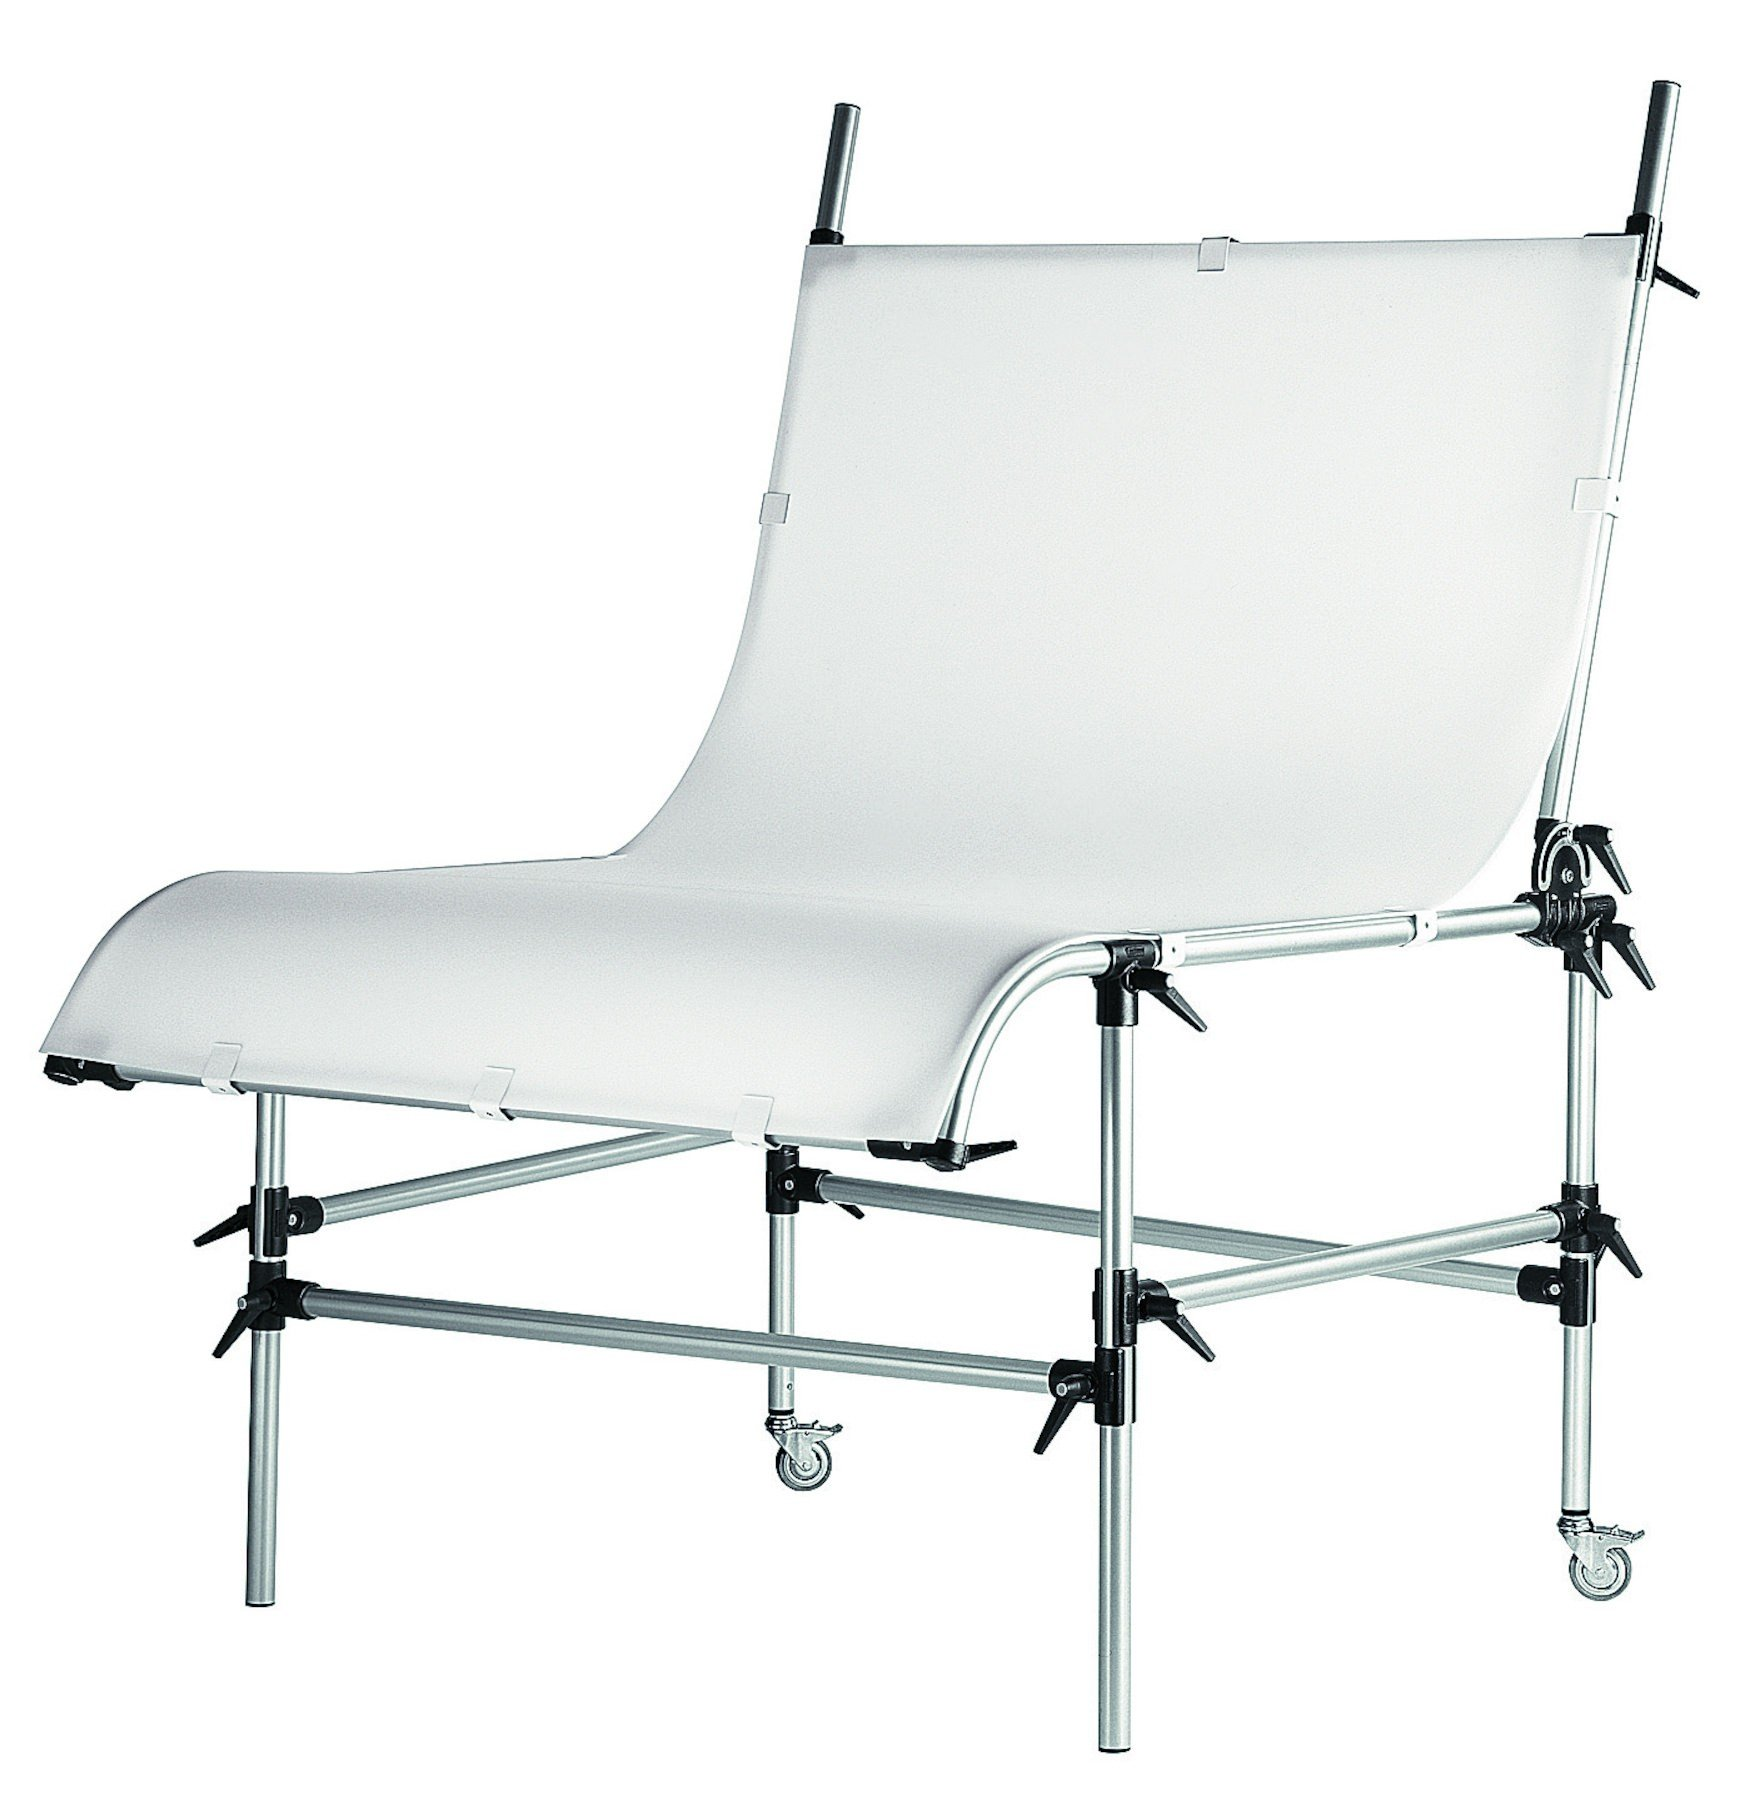 Manfrotto 220 Still Life Table with White Plexi 220-MANFROTTO